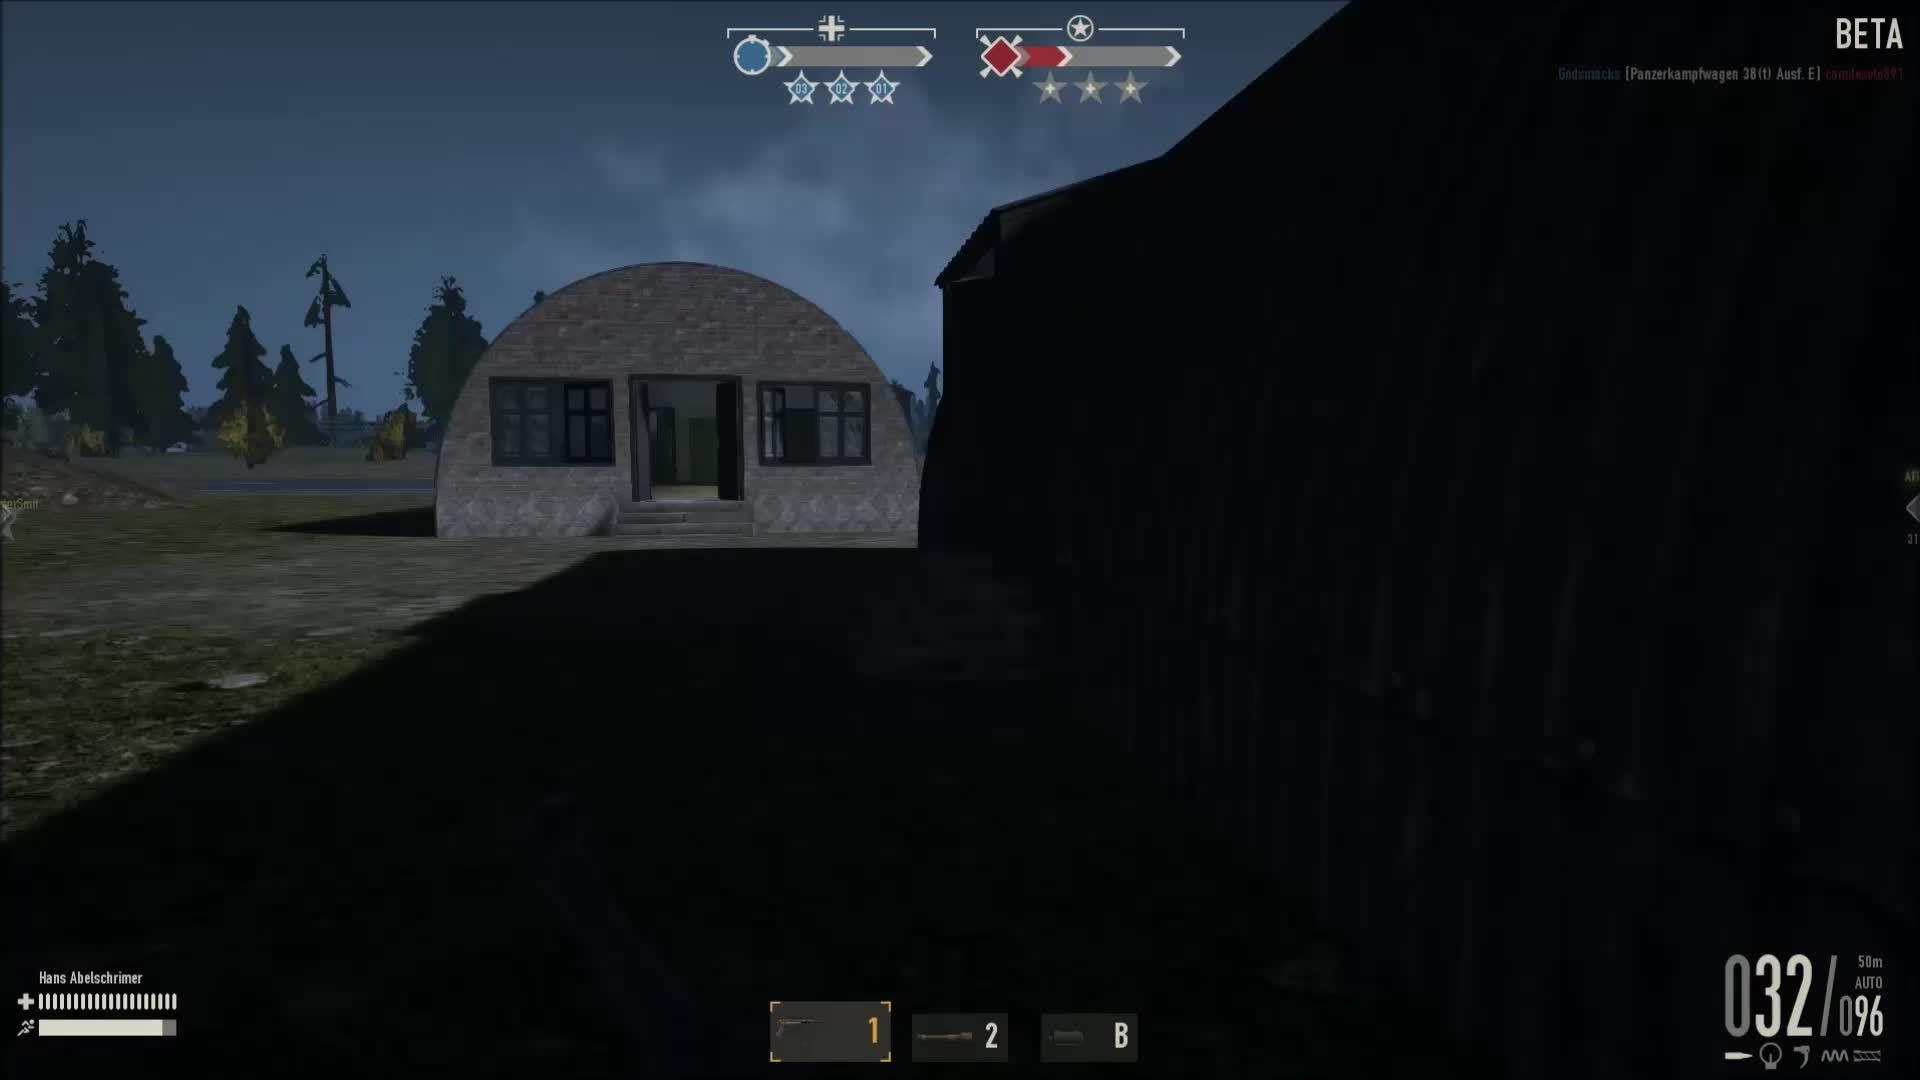 heroesandgenerals, Jumping up a building GIFs